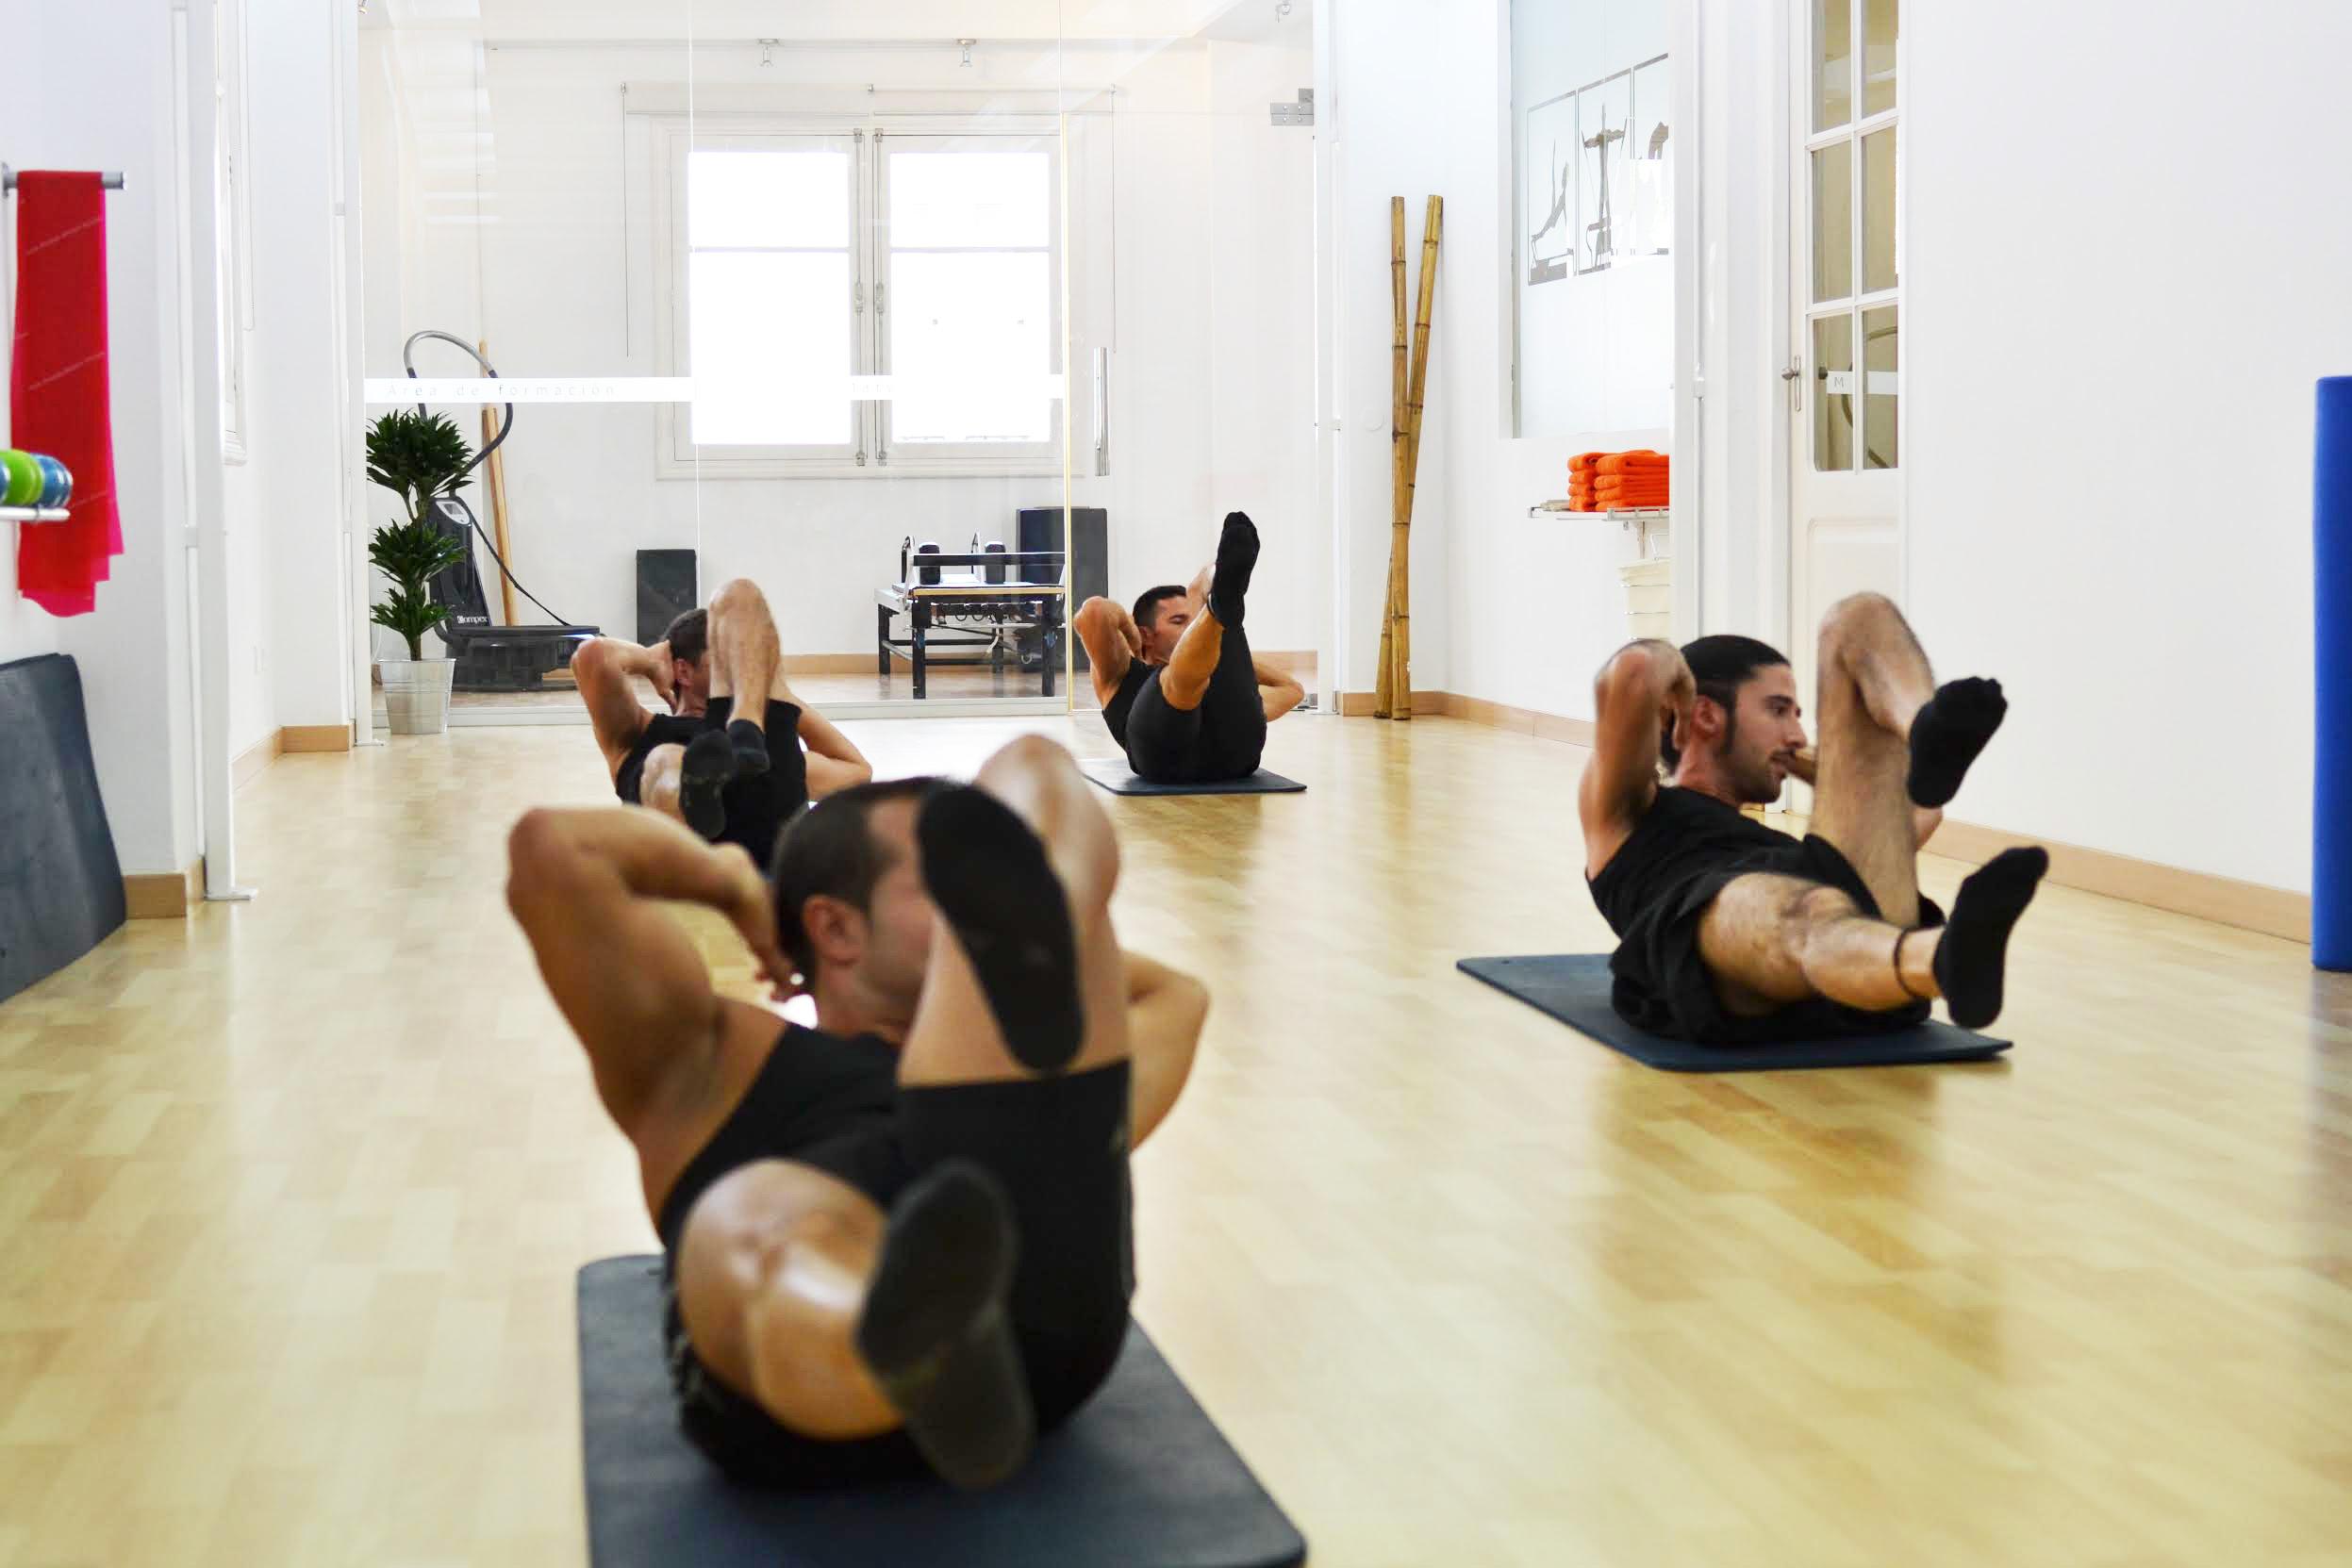 Pilates Estudio y Contrology Club · Personal Pilates Tenerife · Colchoneta